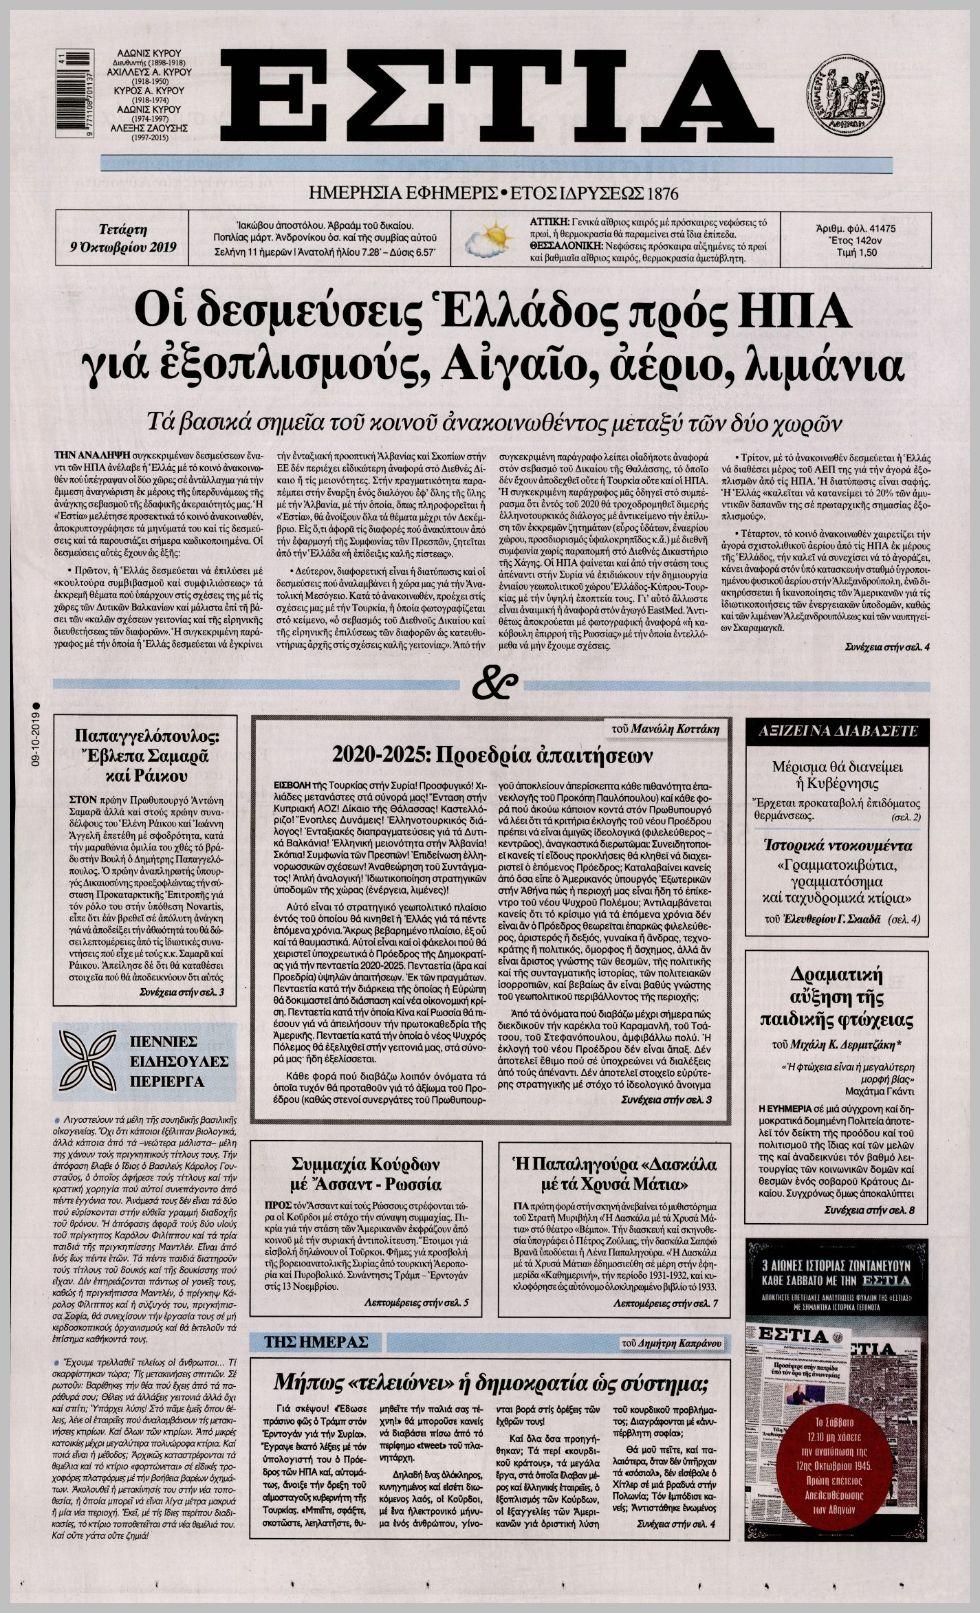 https://protoselida.24media.gr/images/2019/10/09/lrg/20191009_estia_0510.jpg